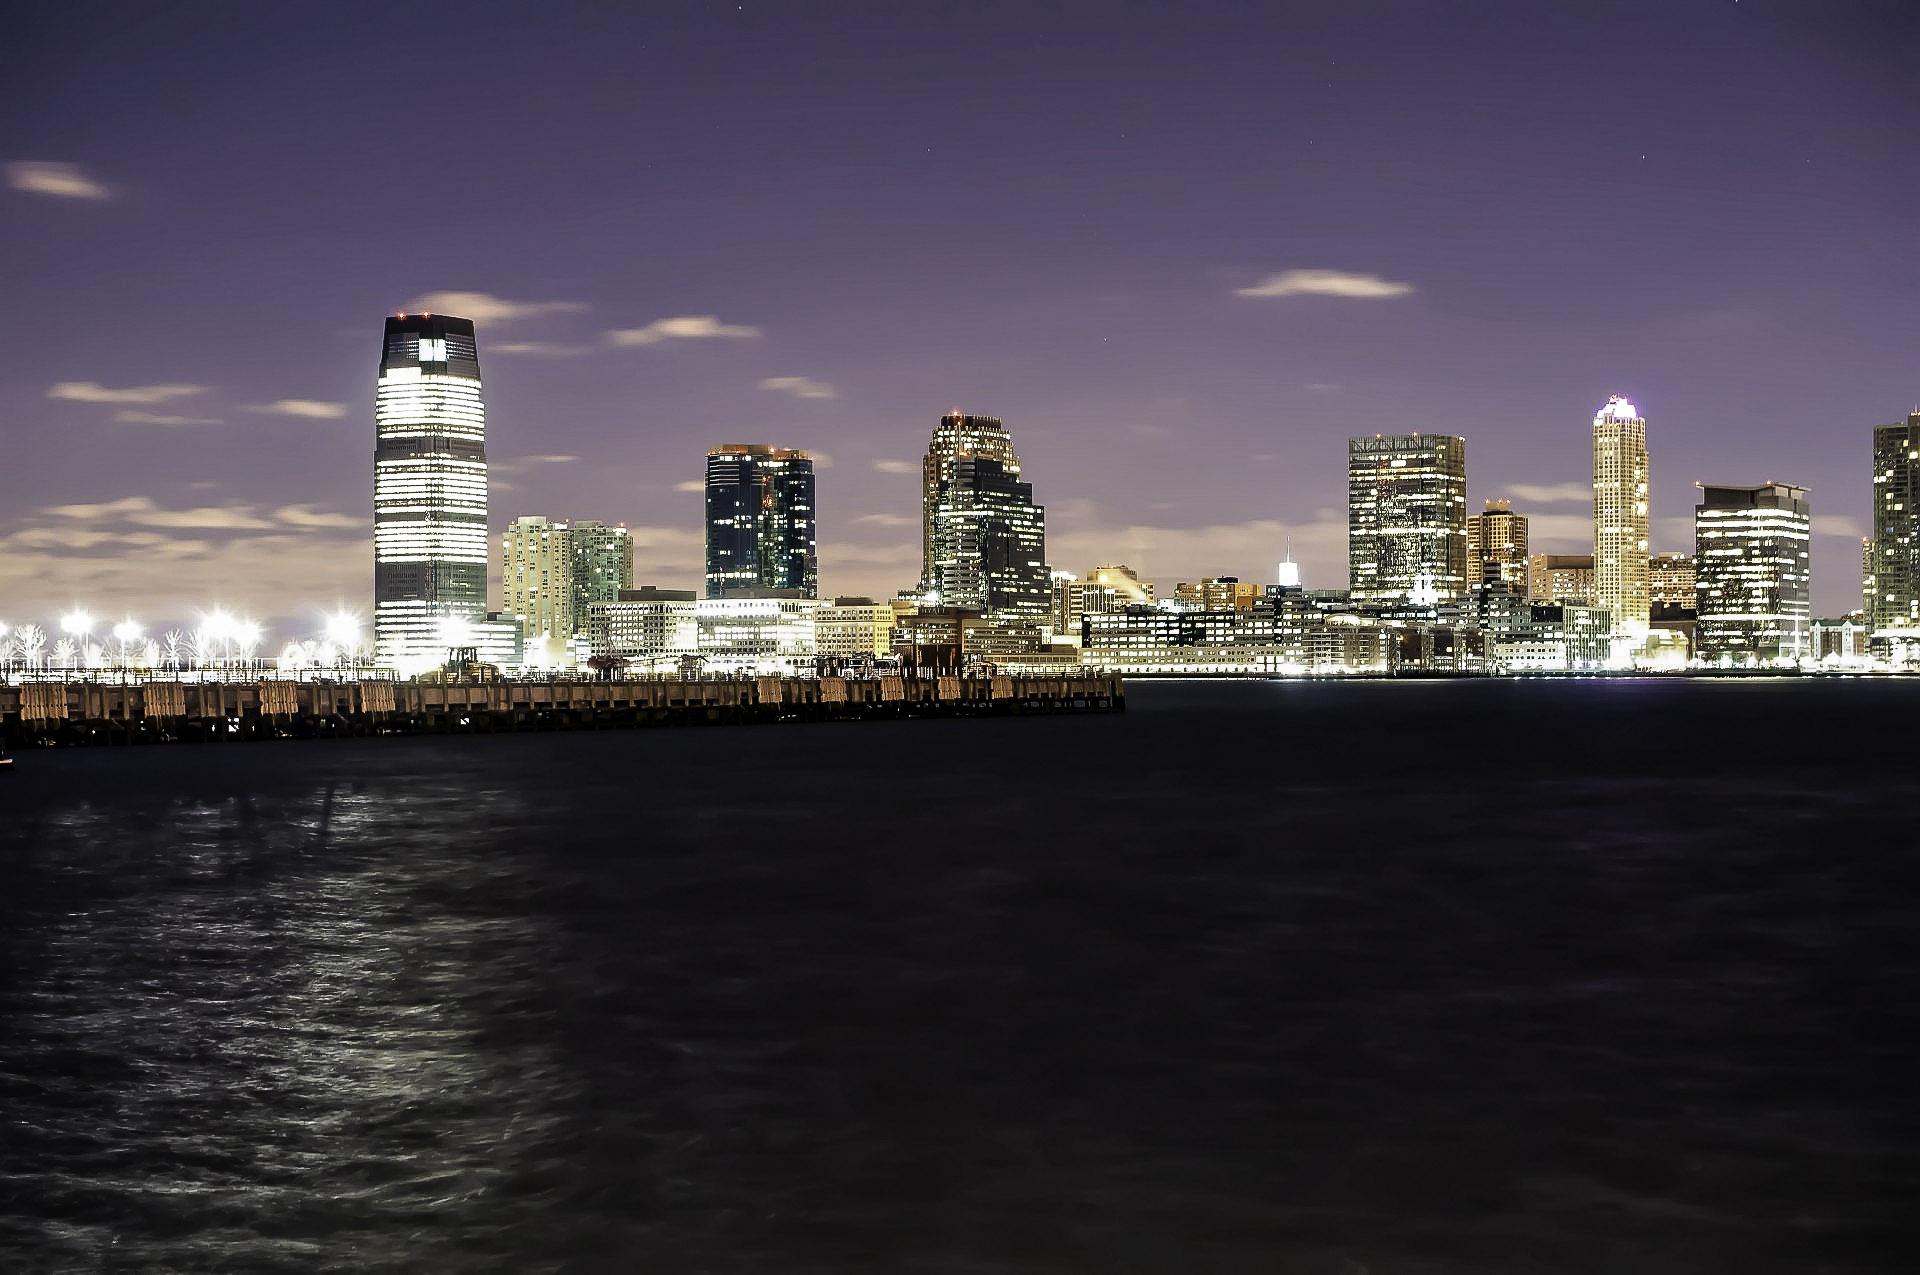 Skyline of Newark, New Jersey image - Free stock photo